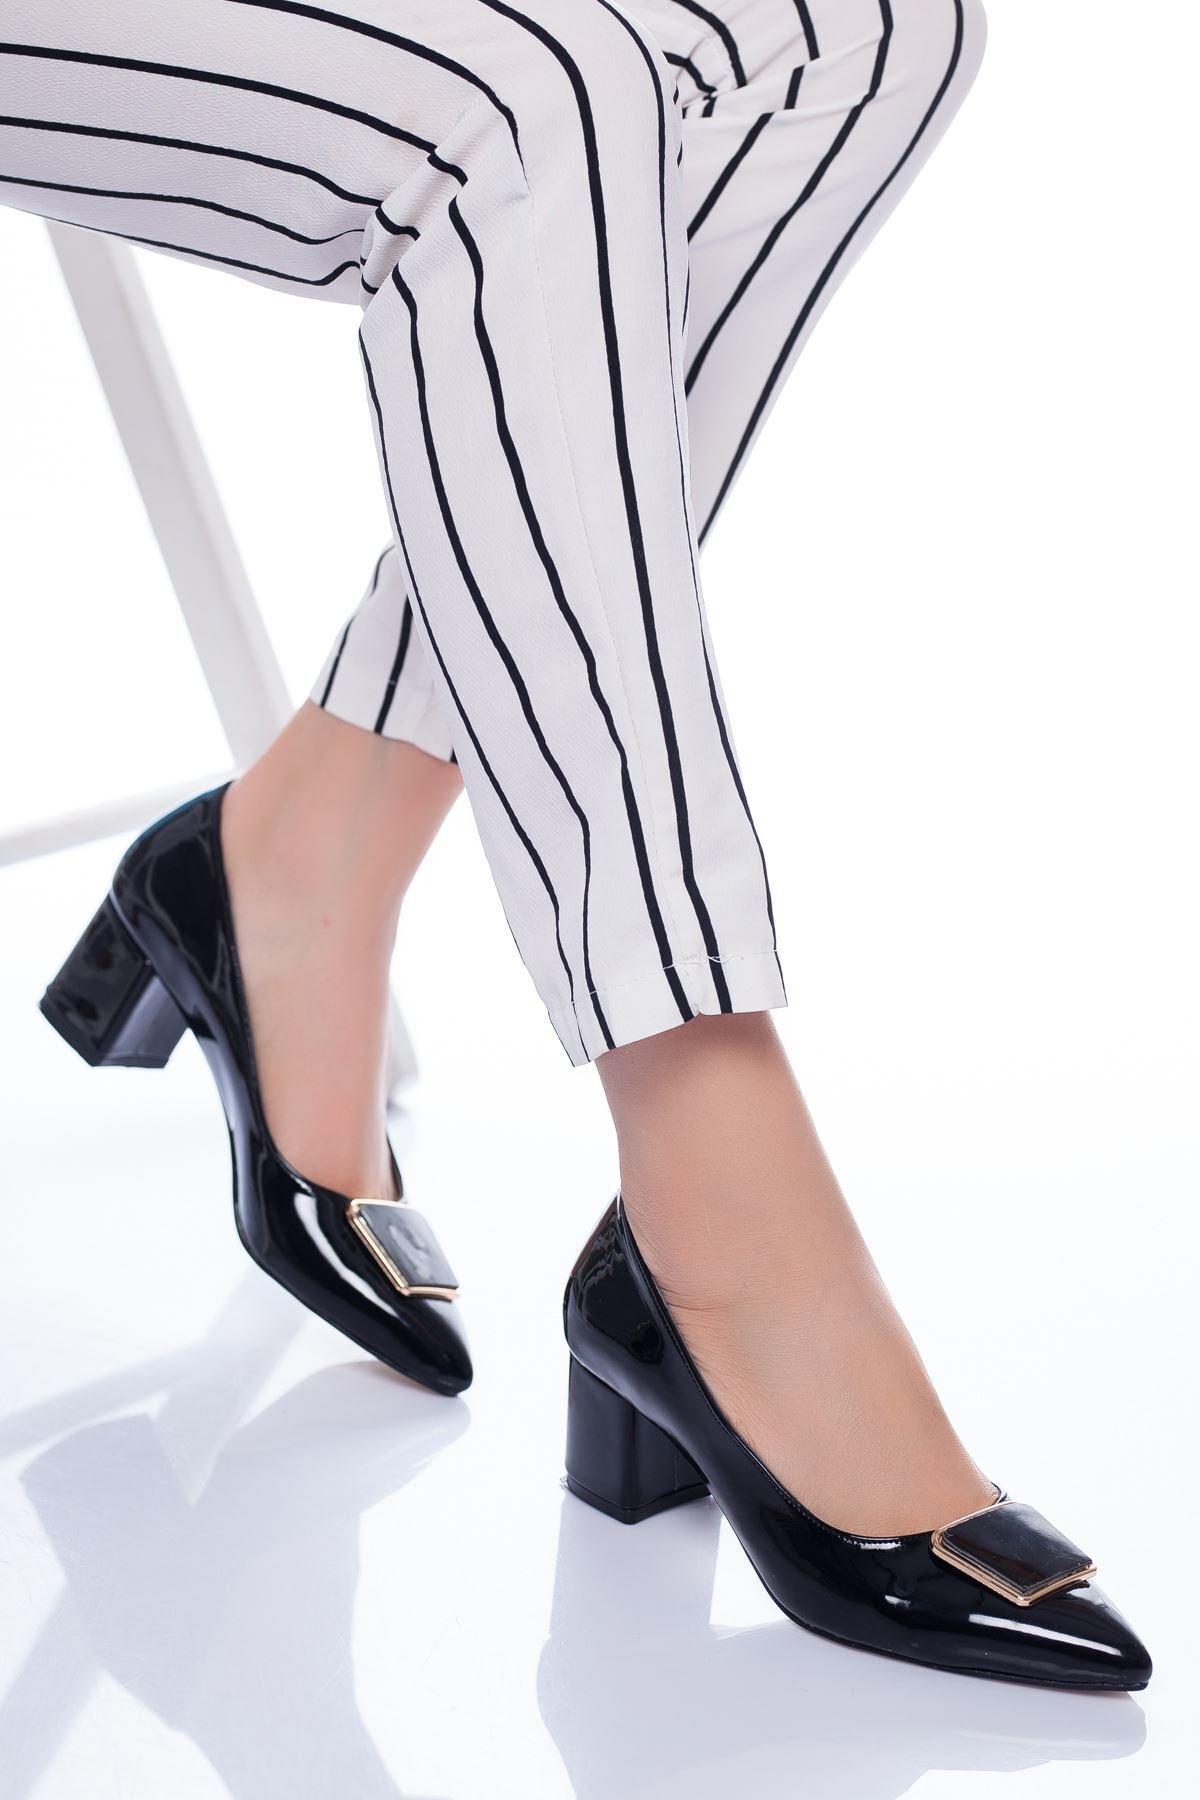 Radikal Kadın Siyah Rugan Topuklu Ayakkabı Della